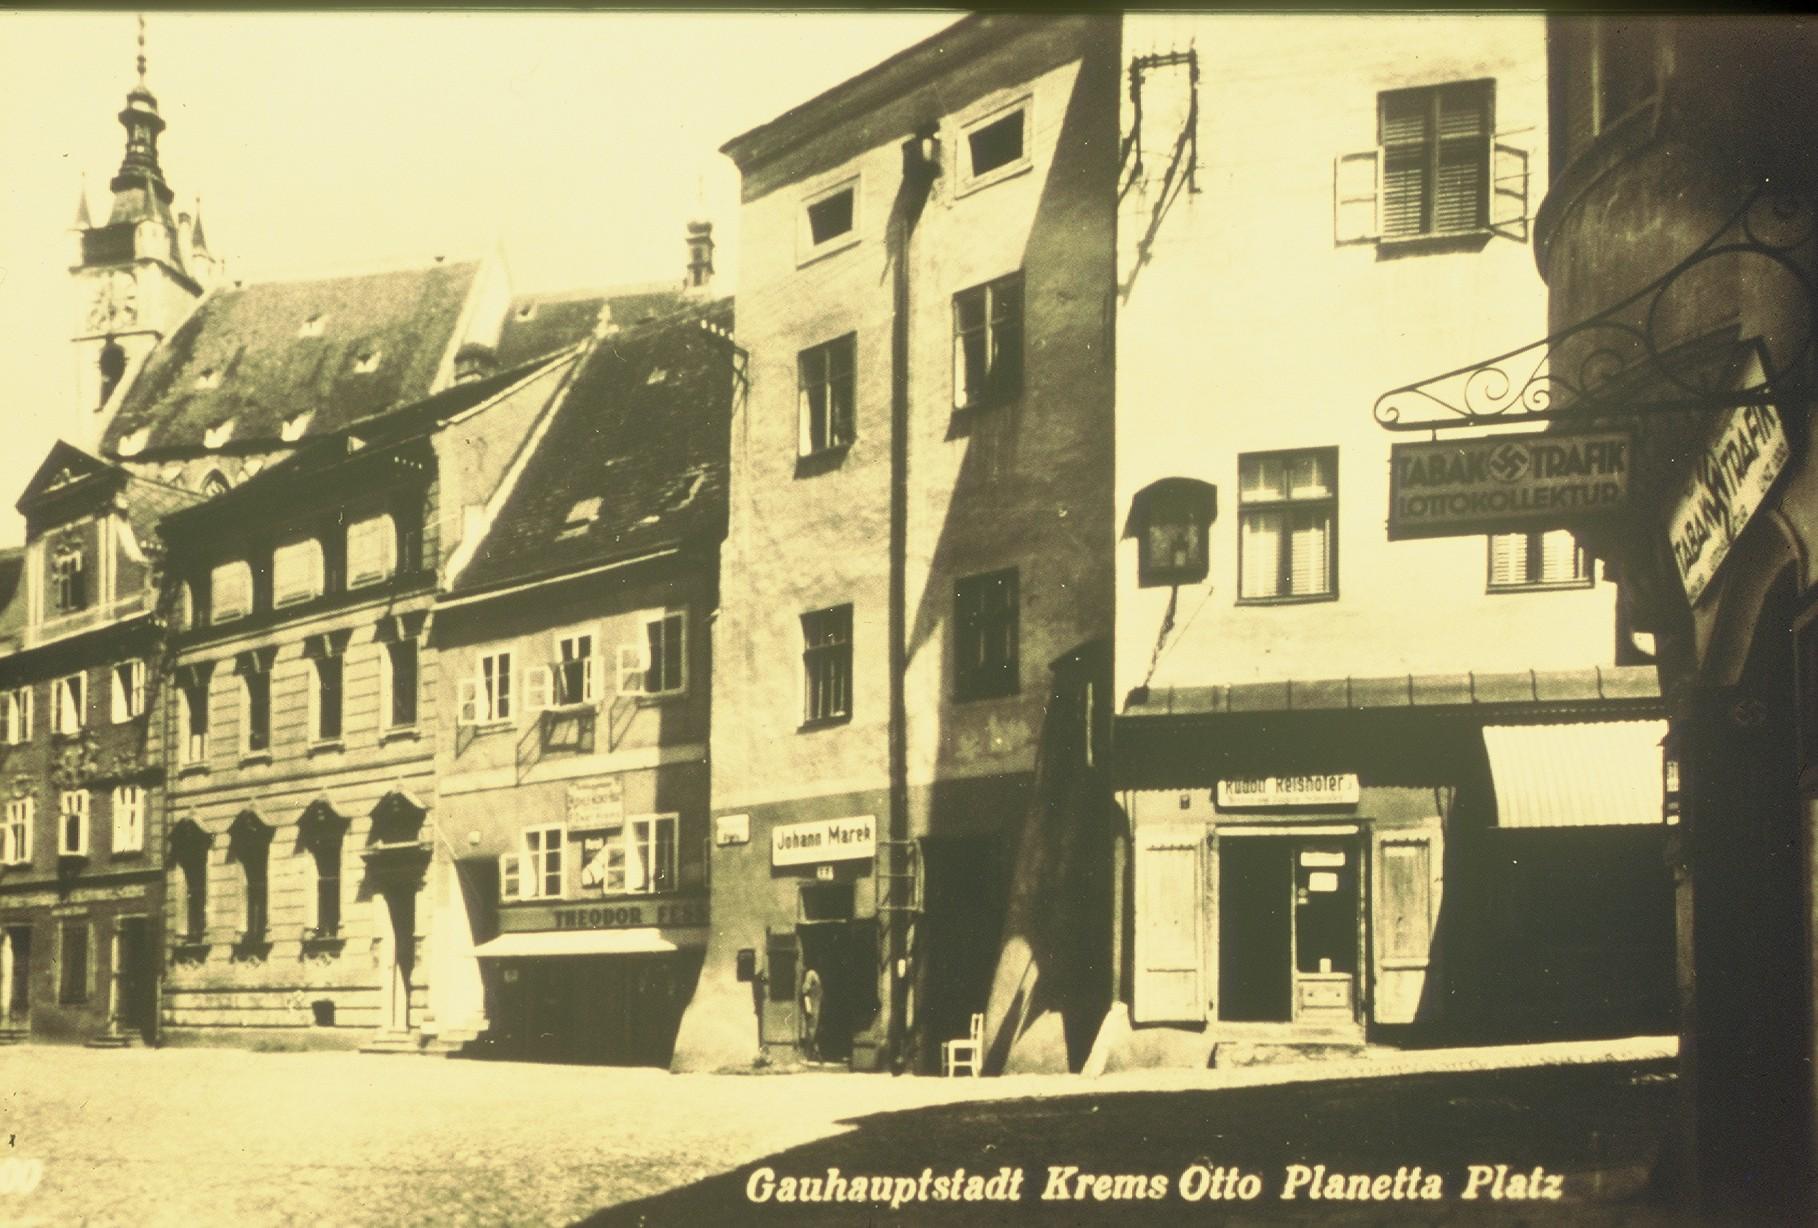 Gauhauptstadt Krems